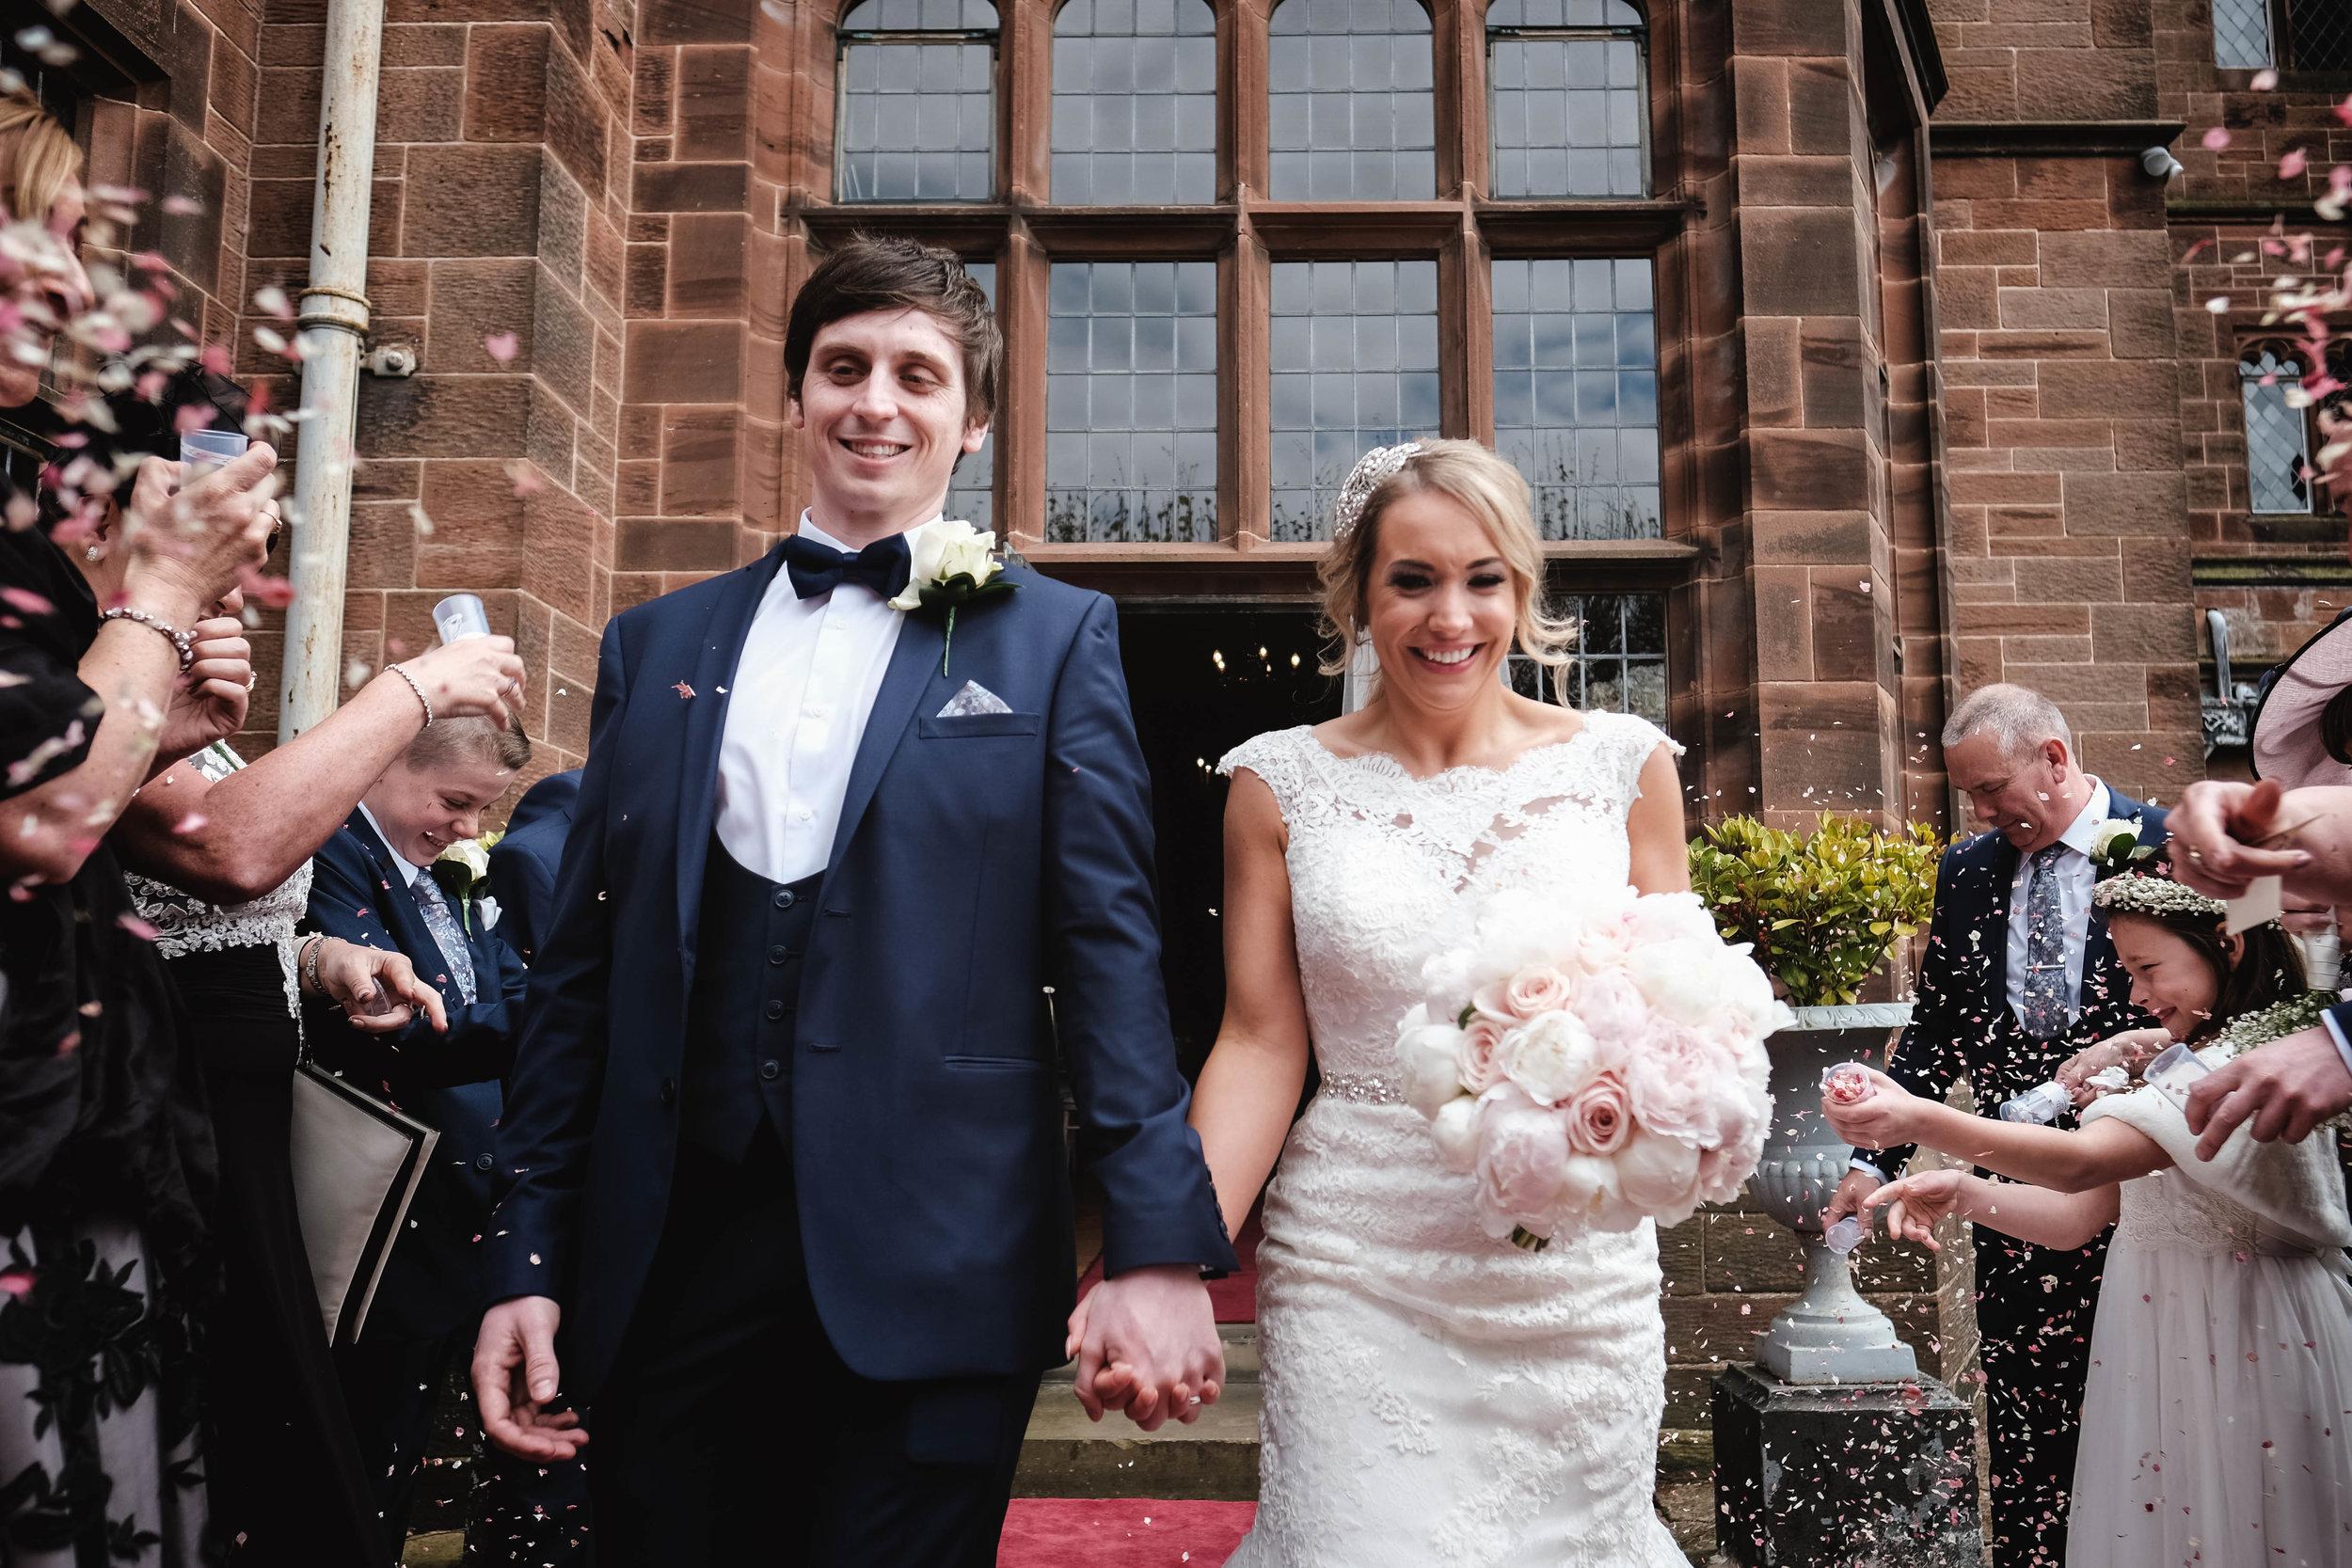 Thornton manor wedding photography cheshire wedding photographer liverpool manchester warrington chester wirral wedding BLOG (44 of 108).jpg